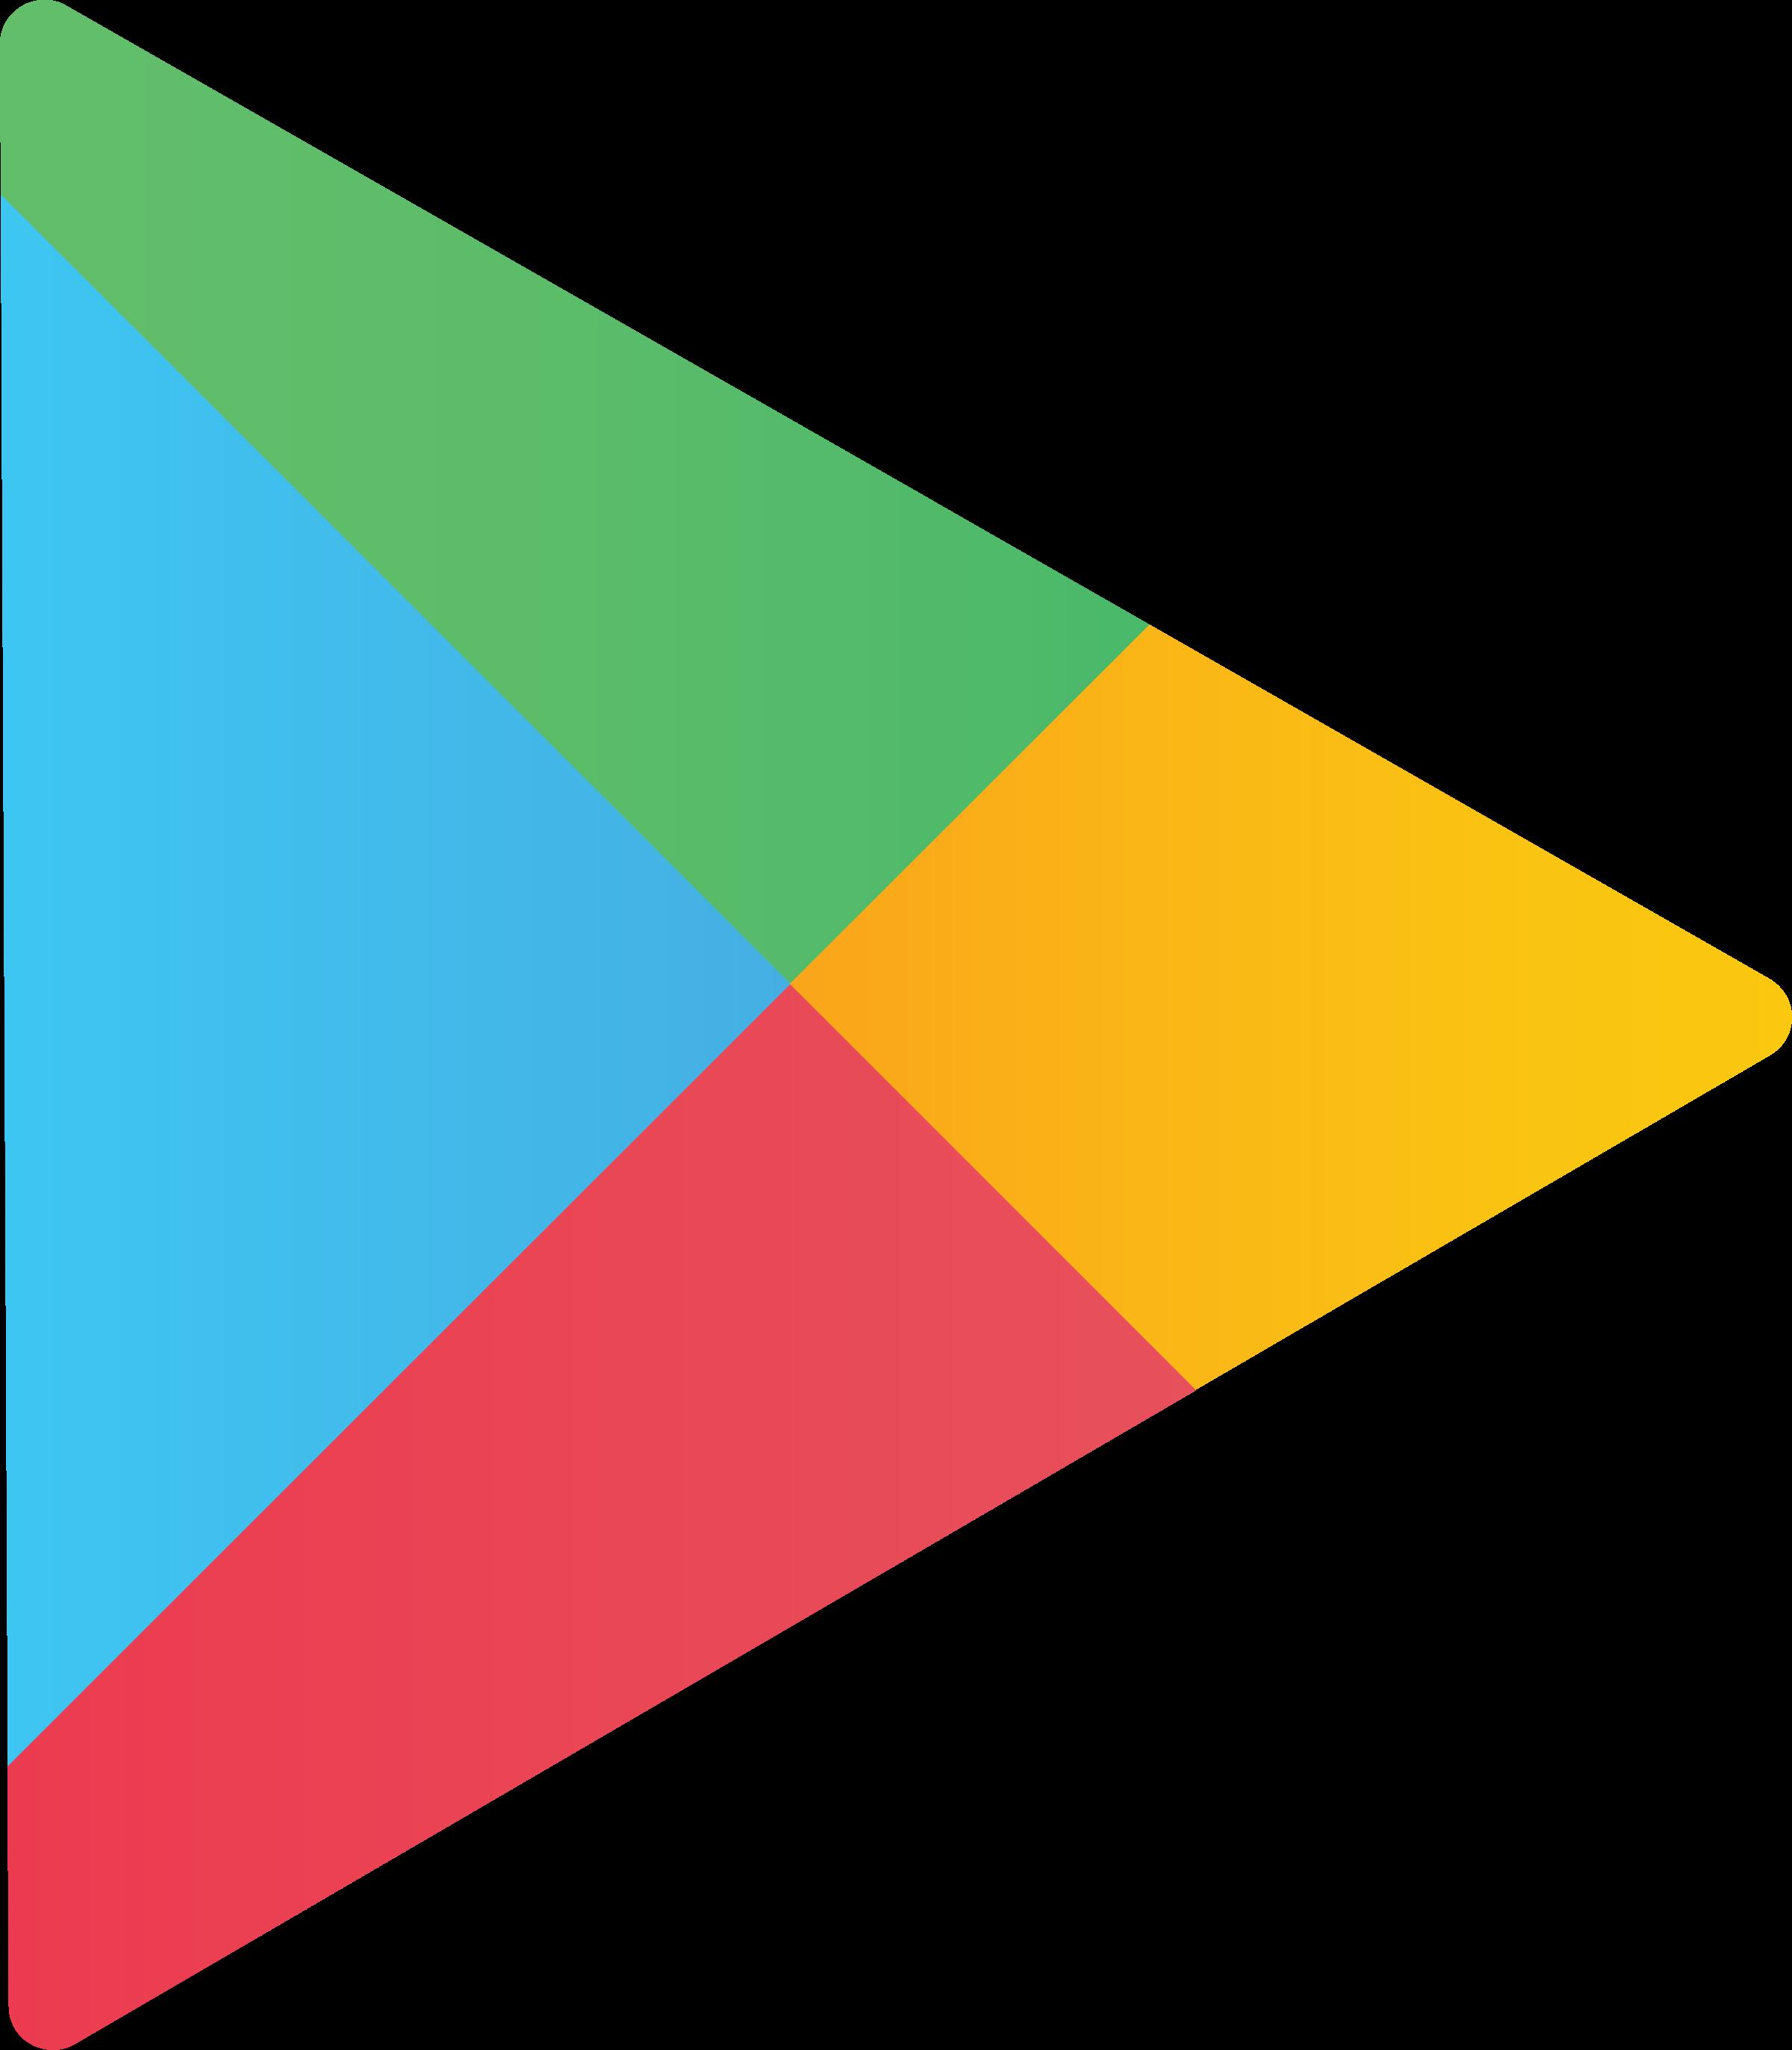 2400x2746 Google Play Store Logo Png Transparent Amp Svg Vector